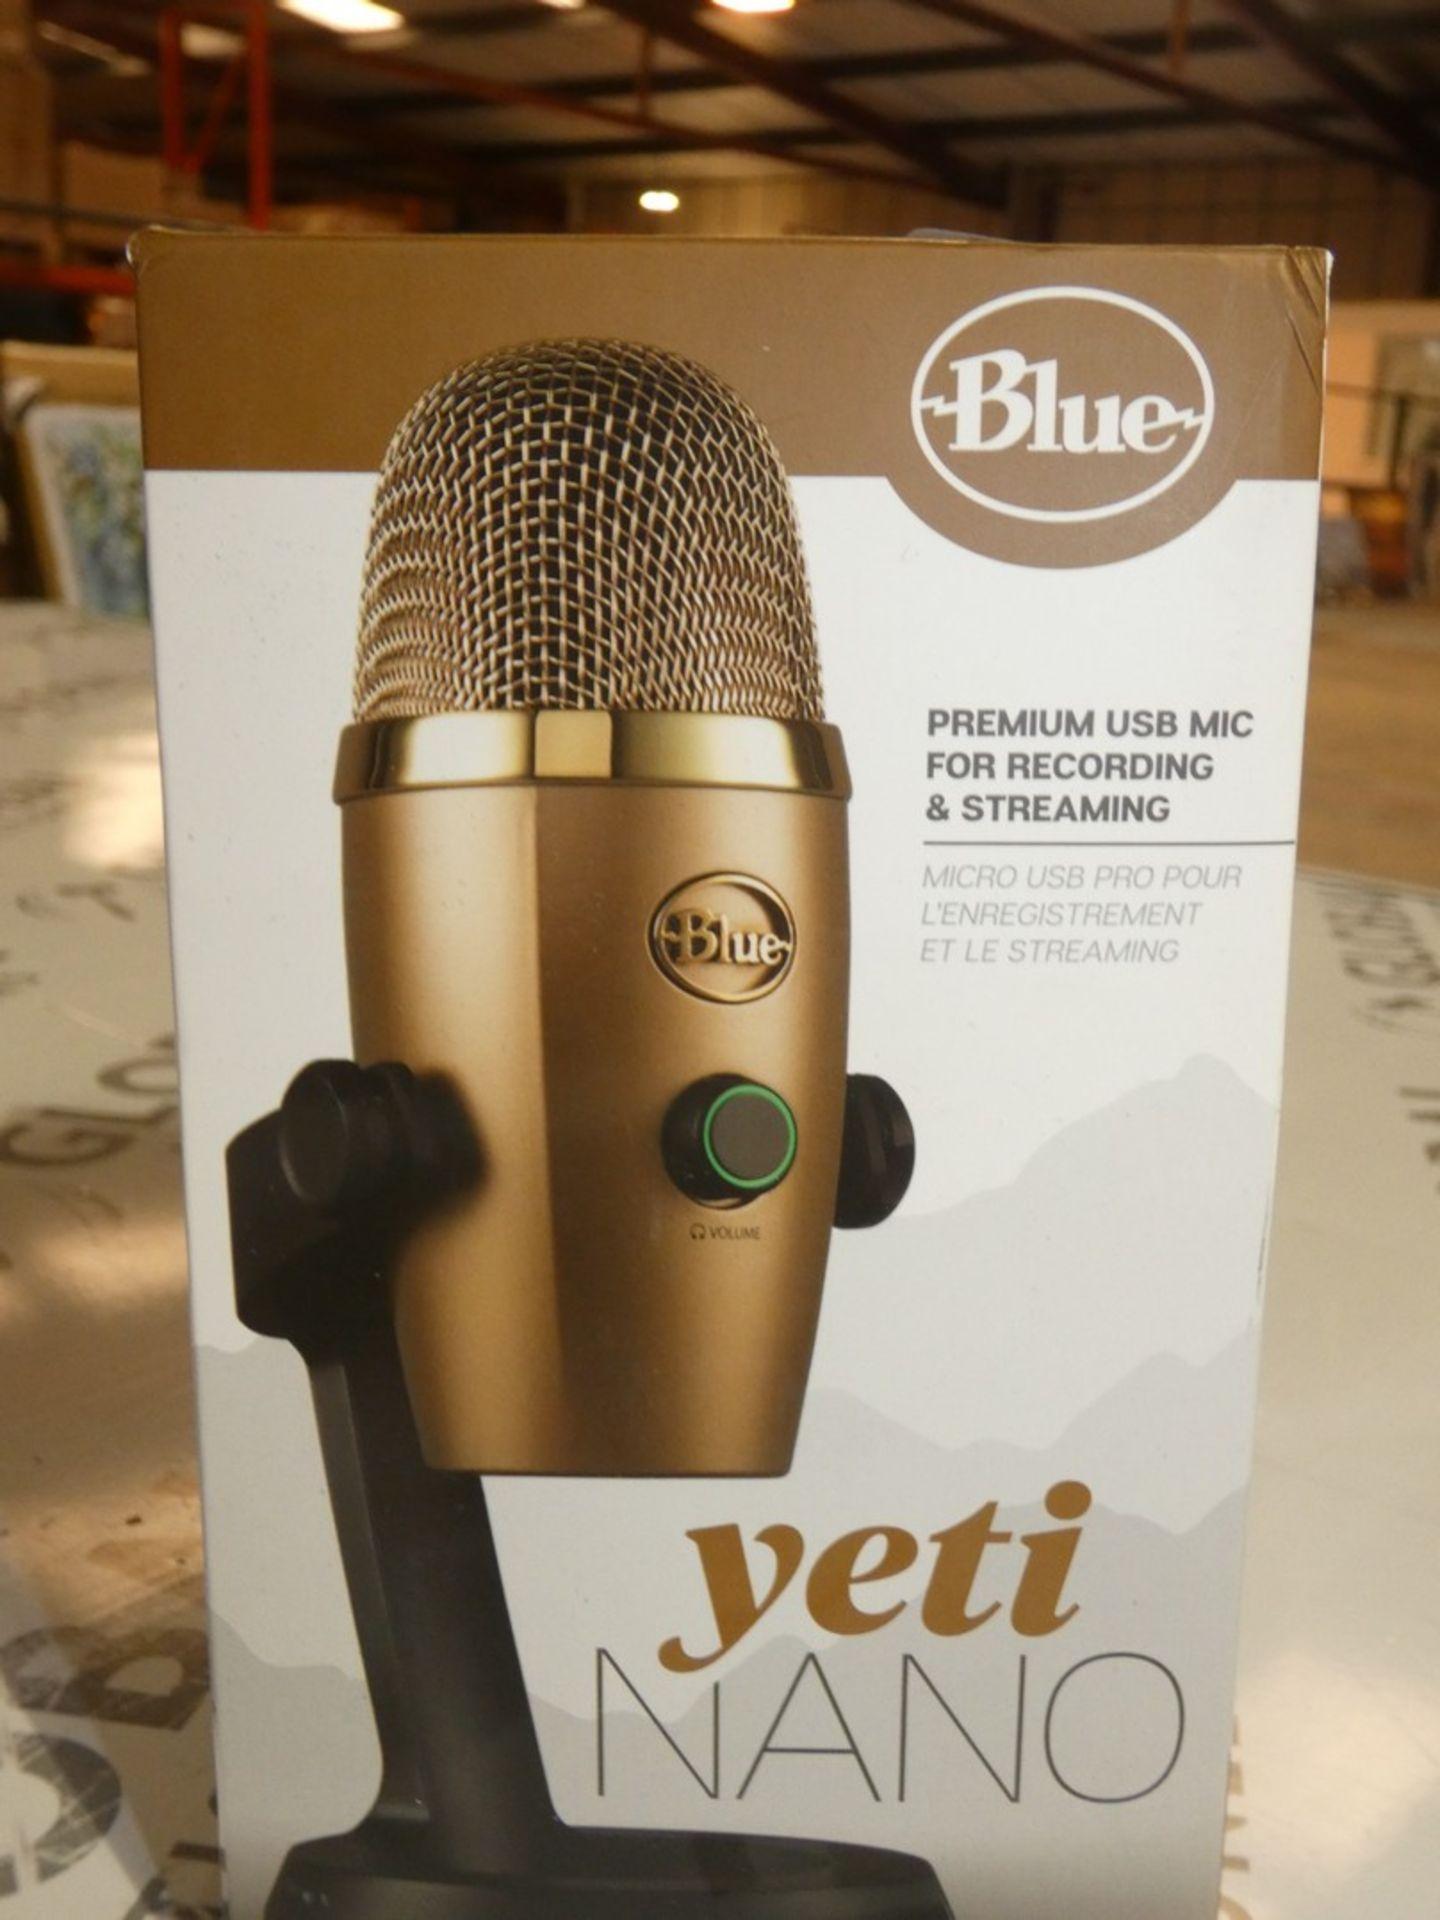 Lot 259 - Boxed Yetti Nano Premium USB Mic For Recording and